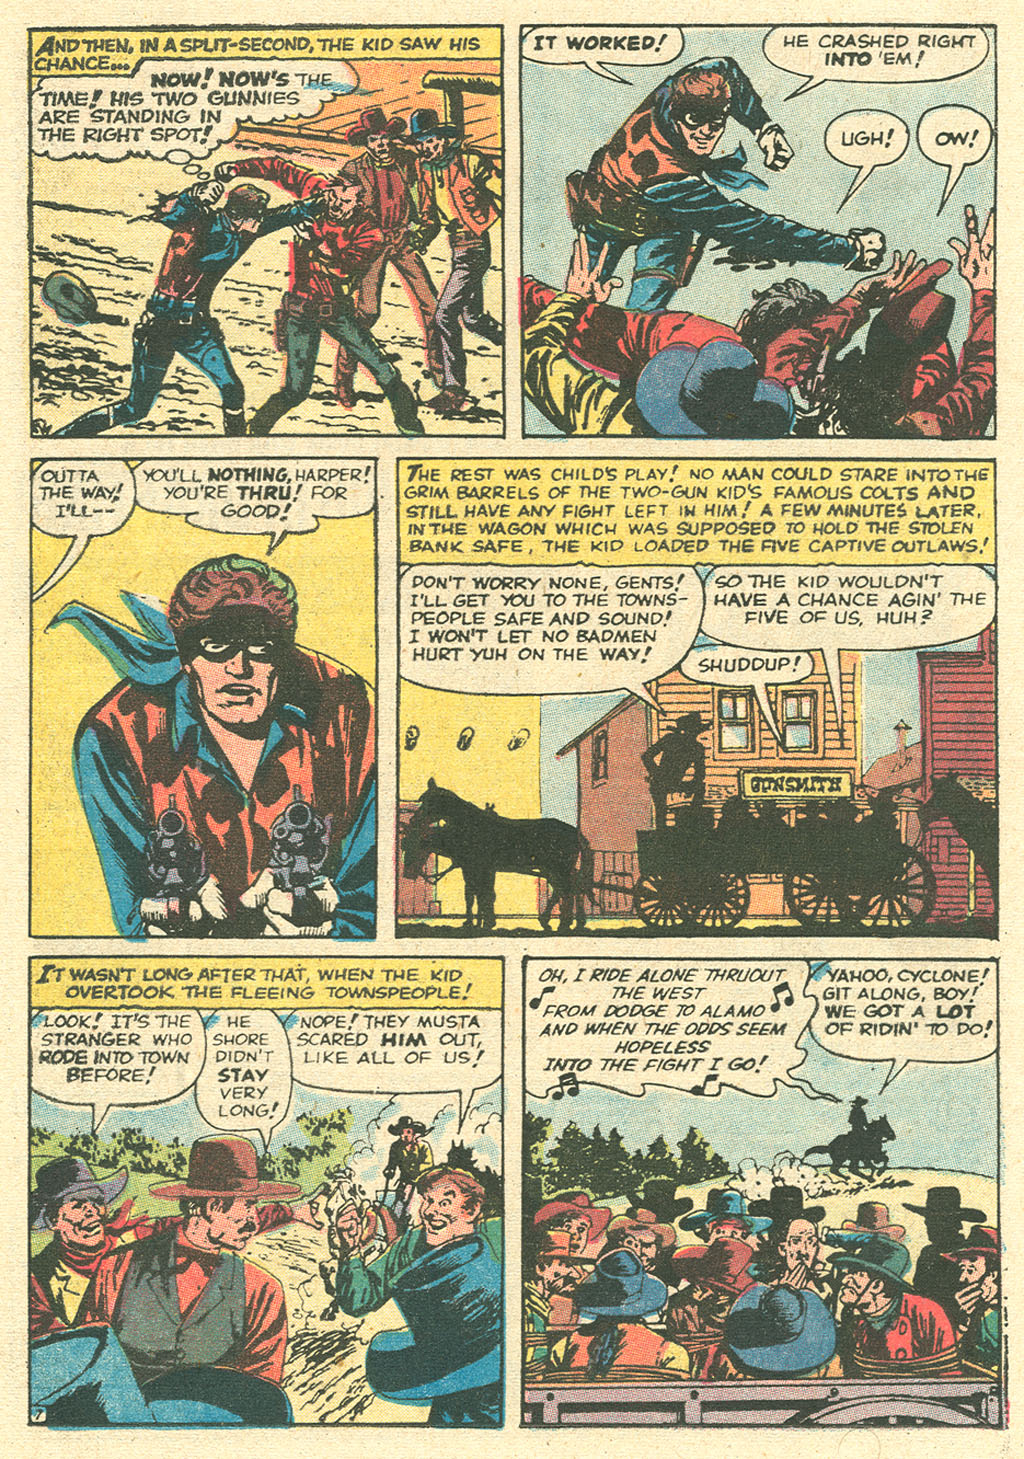 Read online Two-Gun Kid comic -  Issue #99 - 12